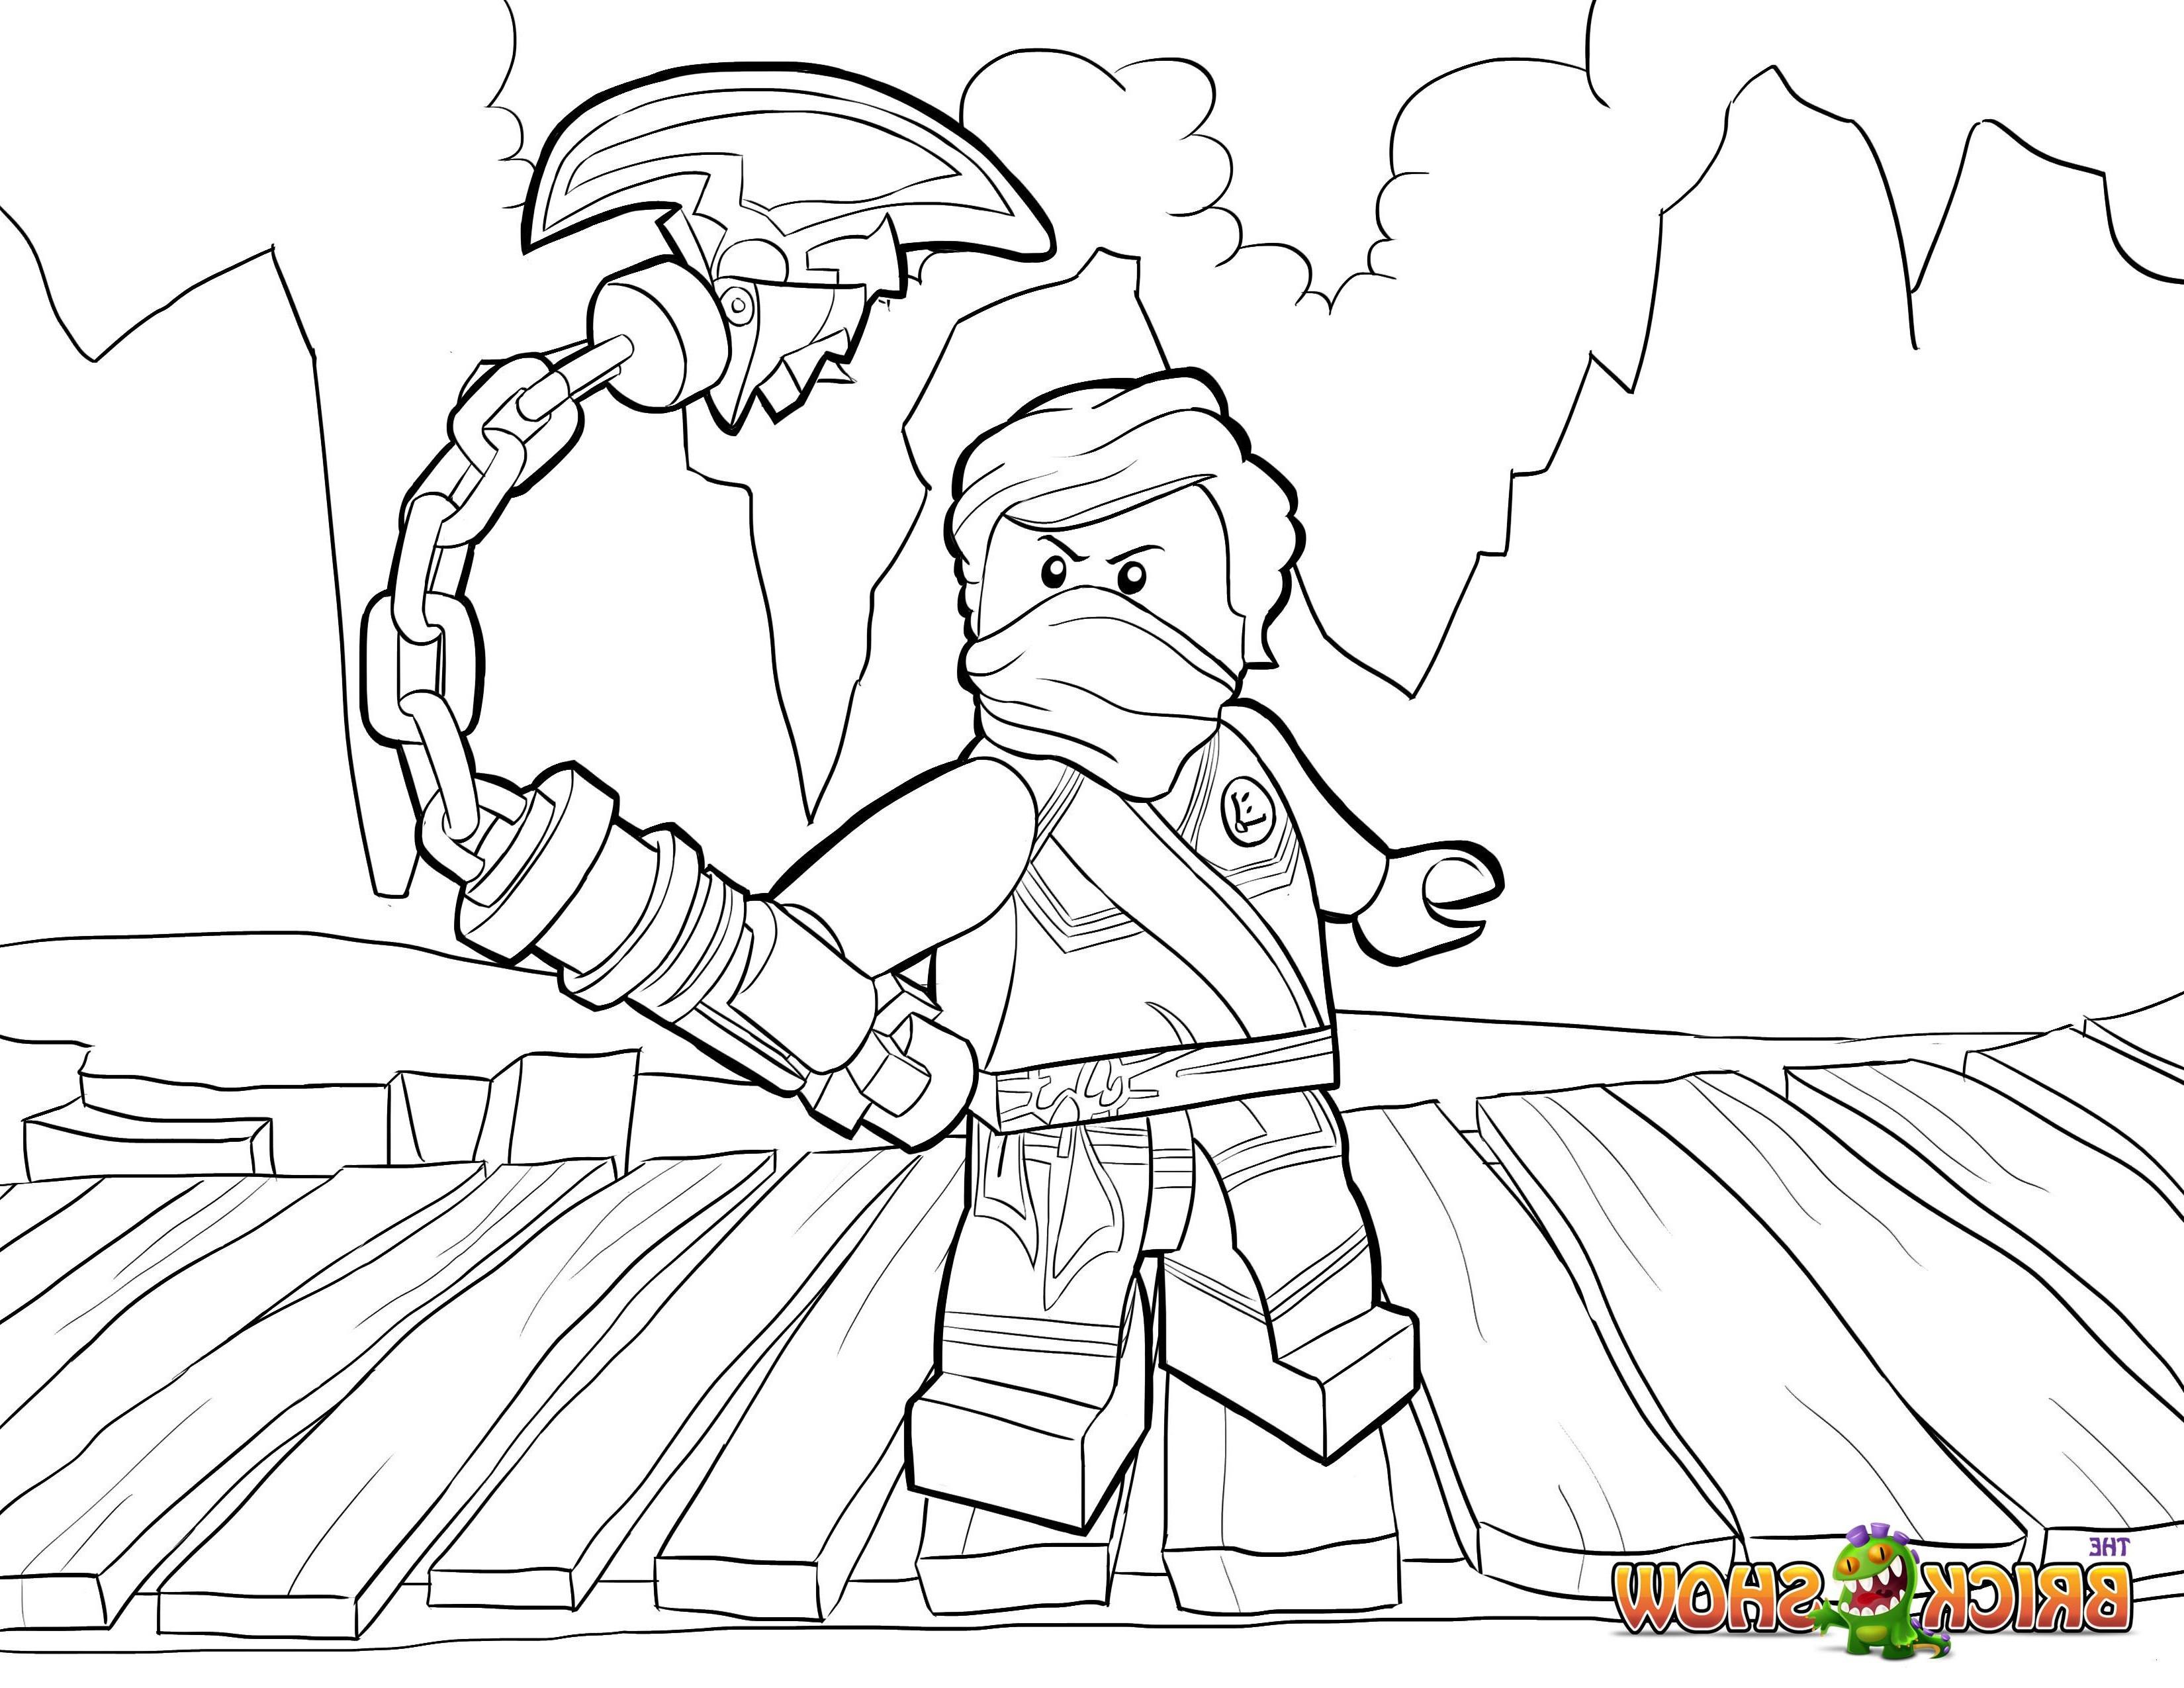 Ninjago Kai Ausmalbilder Inspirierend 38 Fantastisch Ausmalbilder Ninjago Drache – Große Coloring Page Das Bild